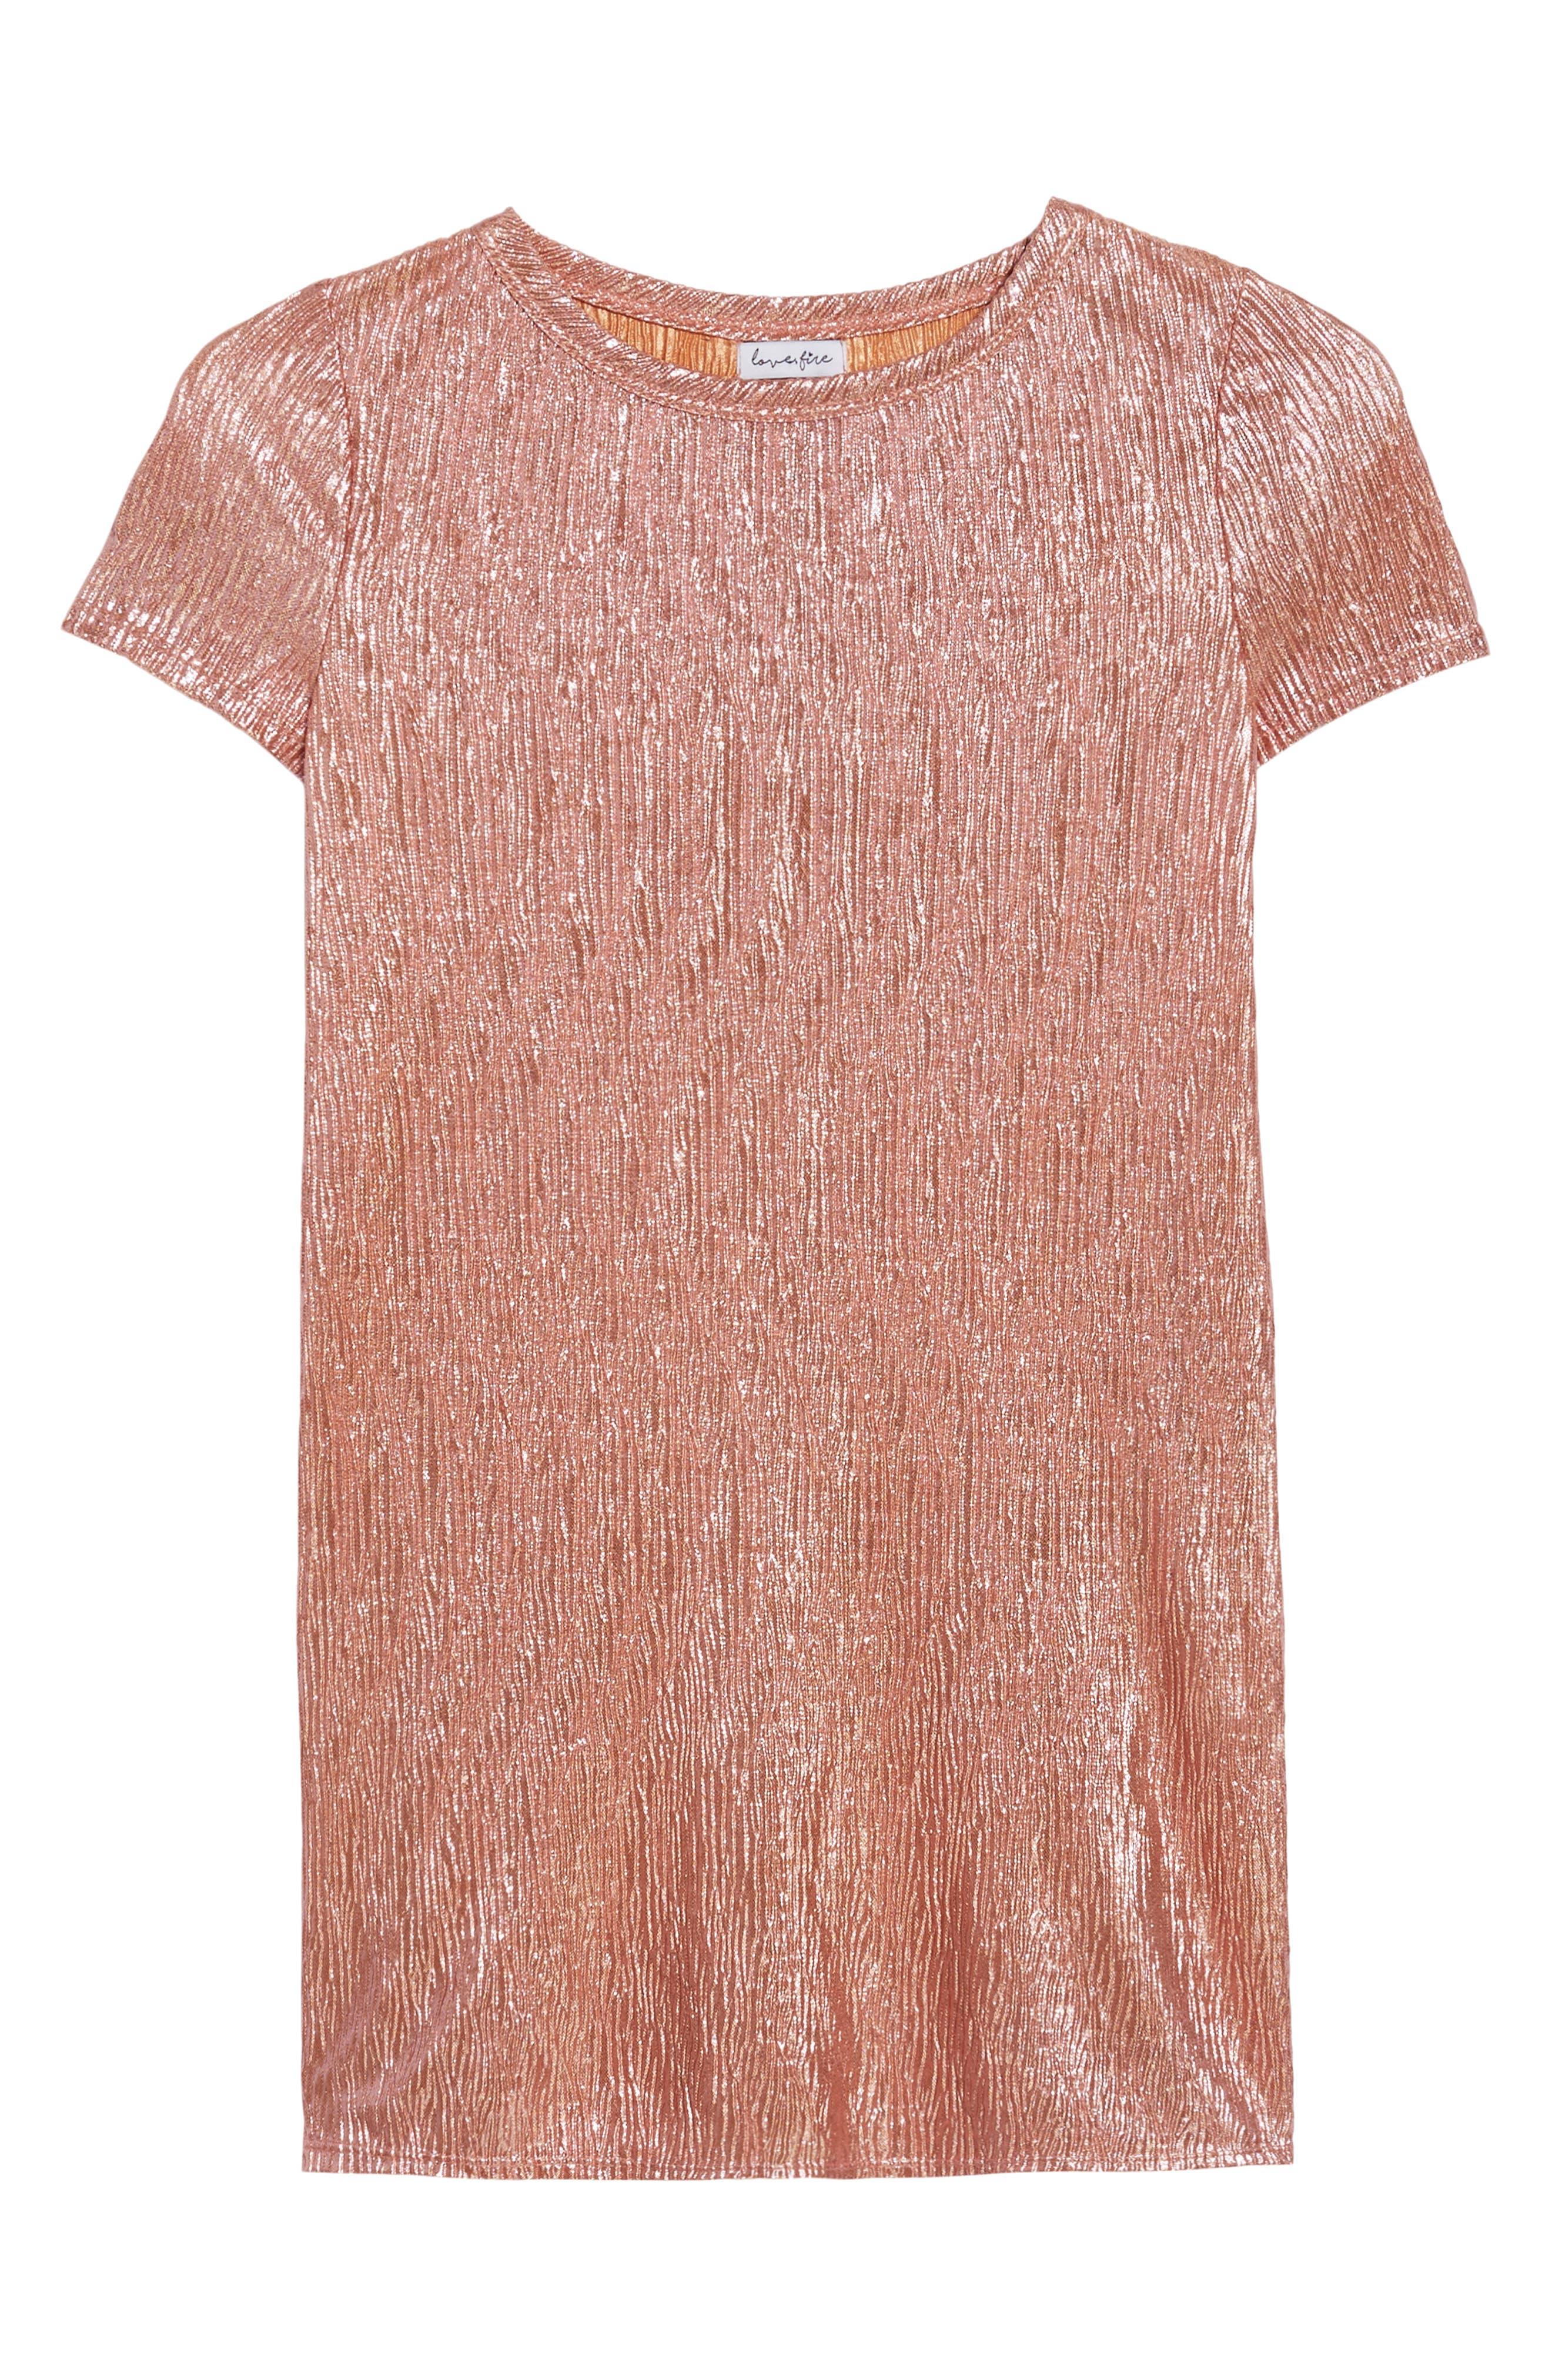 Love Fire Crinkled Metallic T-Shirt Dress,                             Main thumbnail 1, color,                             Pink